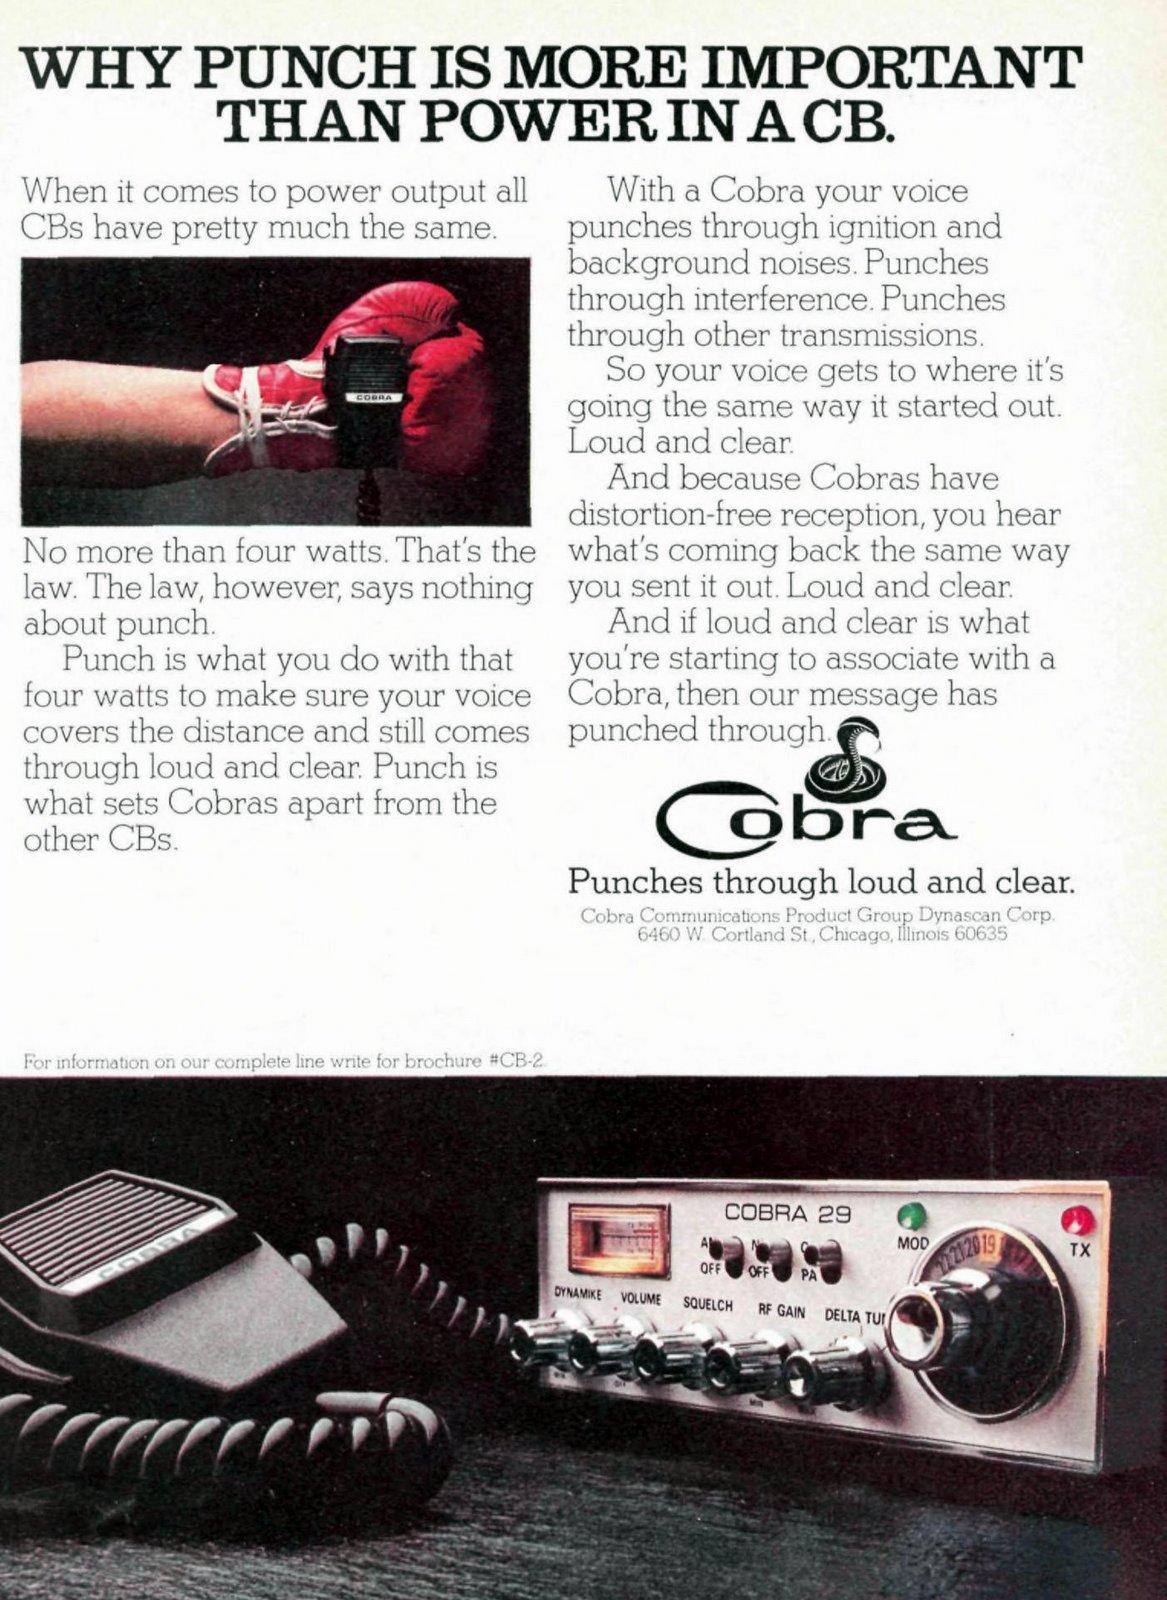 Cobra vintage CB radio (1976)